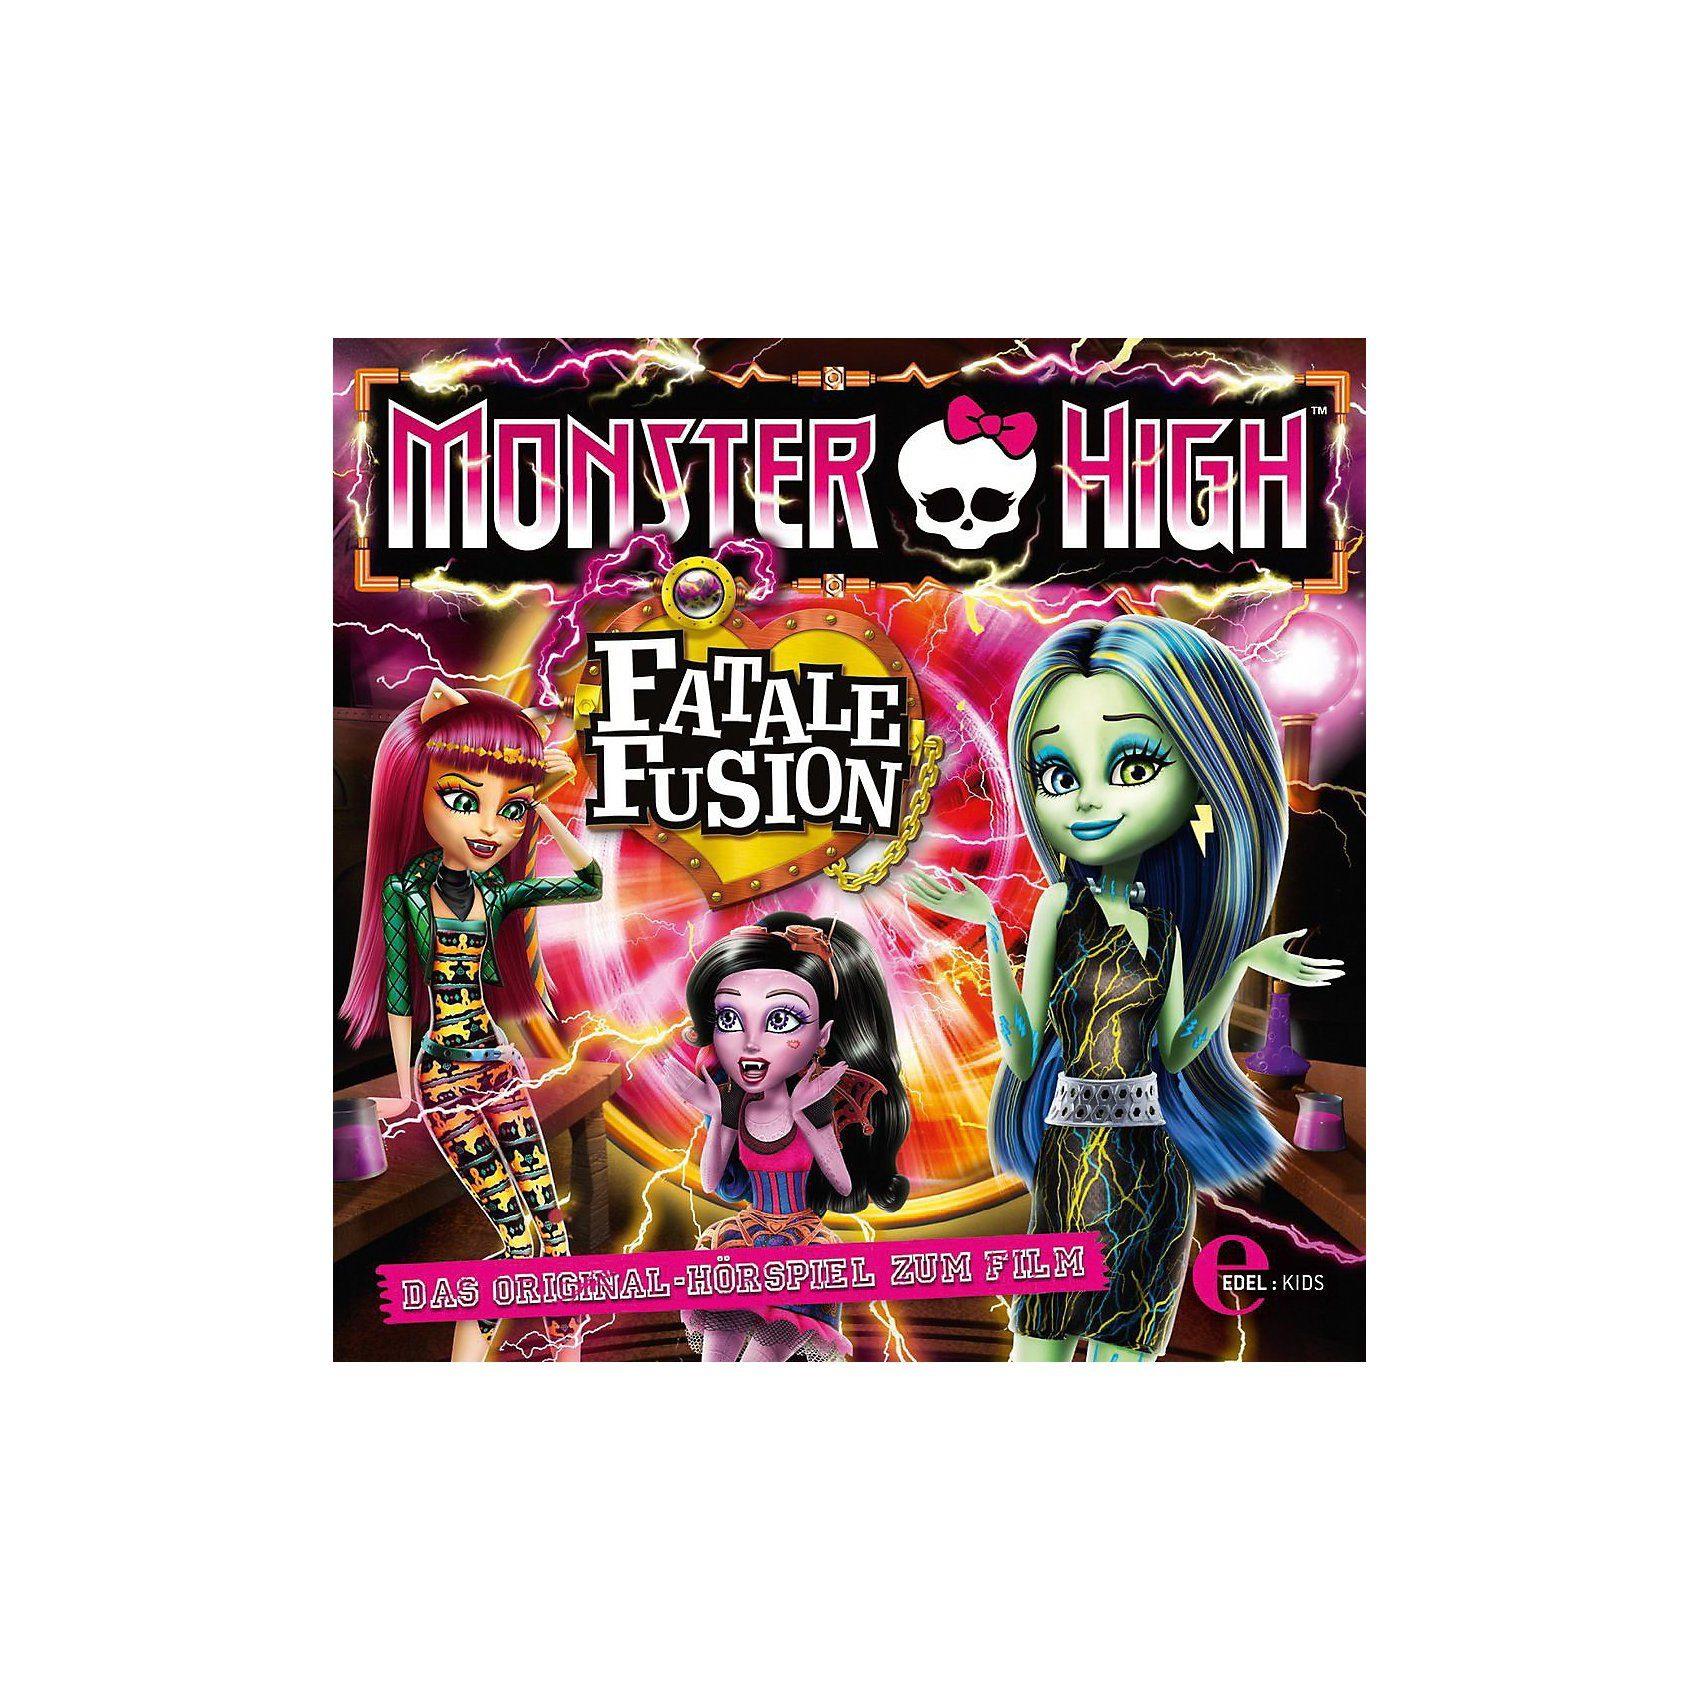 Edel CD Monster High - Fatale Fusion